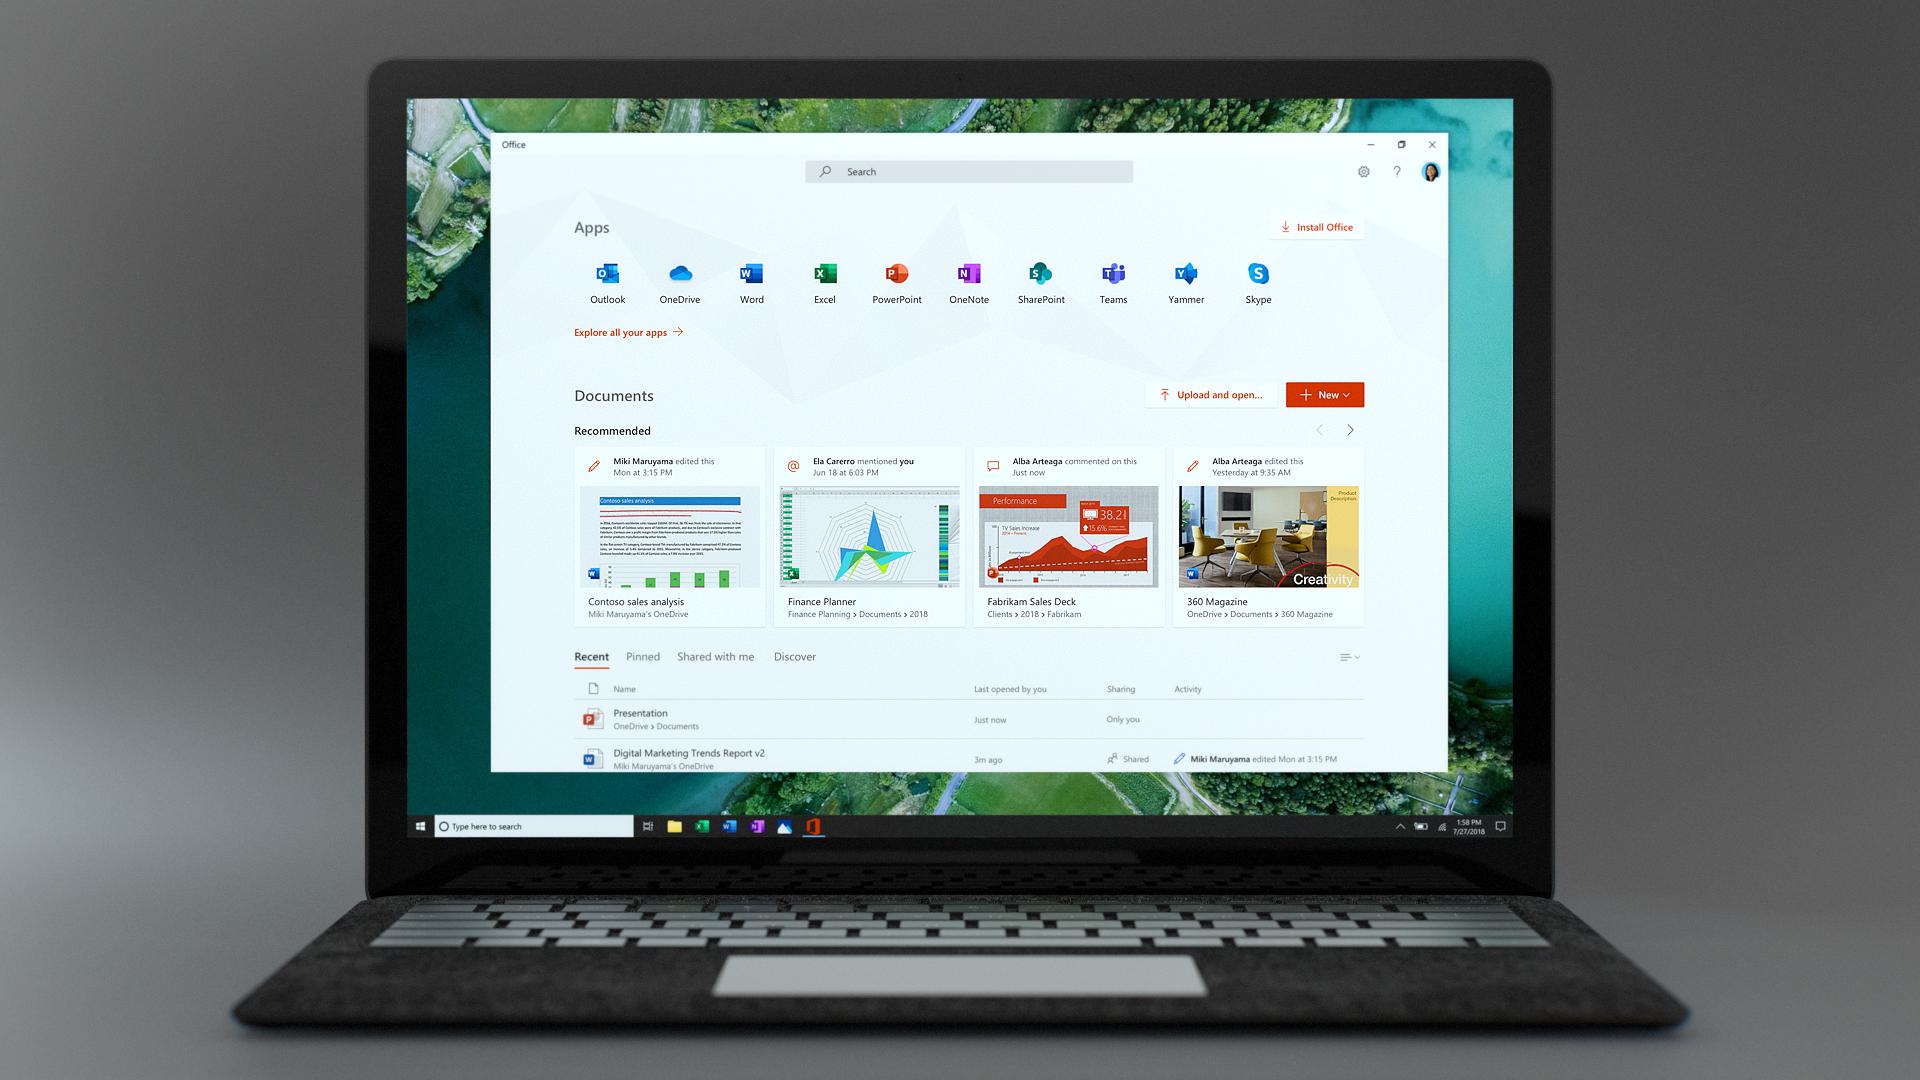 Introduzione all'app Office per Windows 10